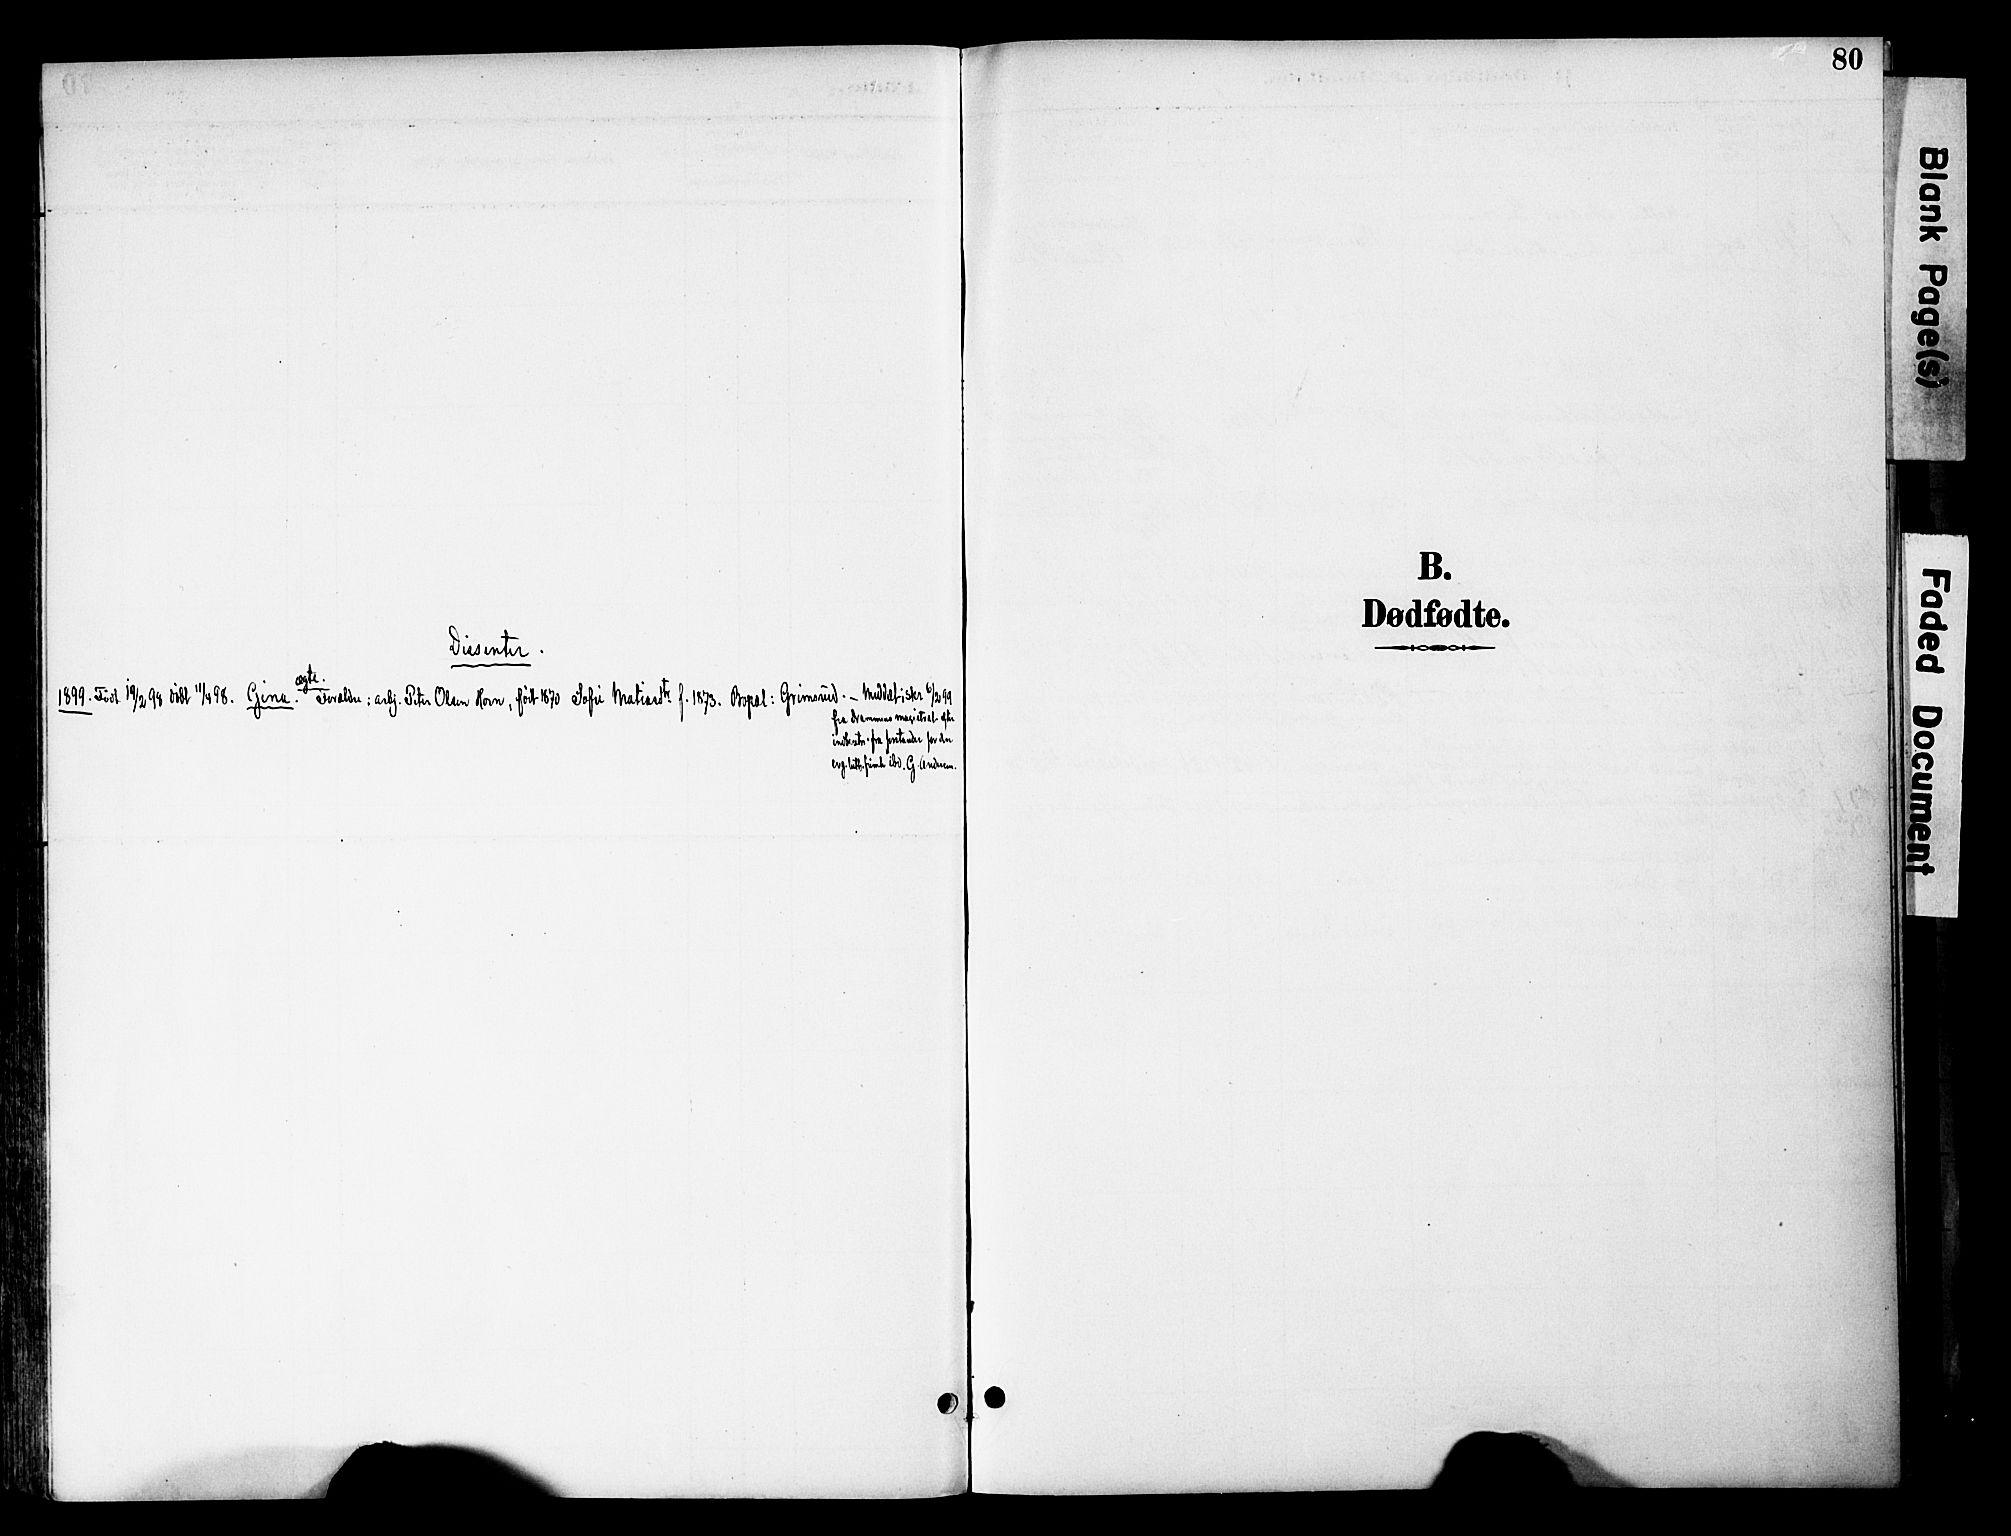 SAH, Gran prestekontor, Parish register (official) no. 20, 1889-1899, p. 80